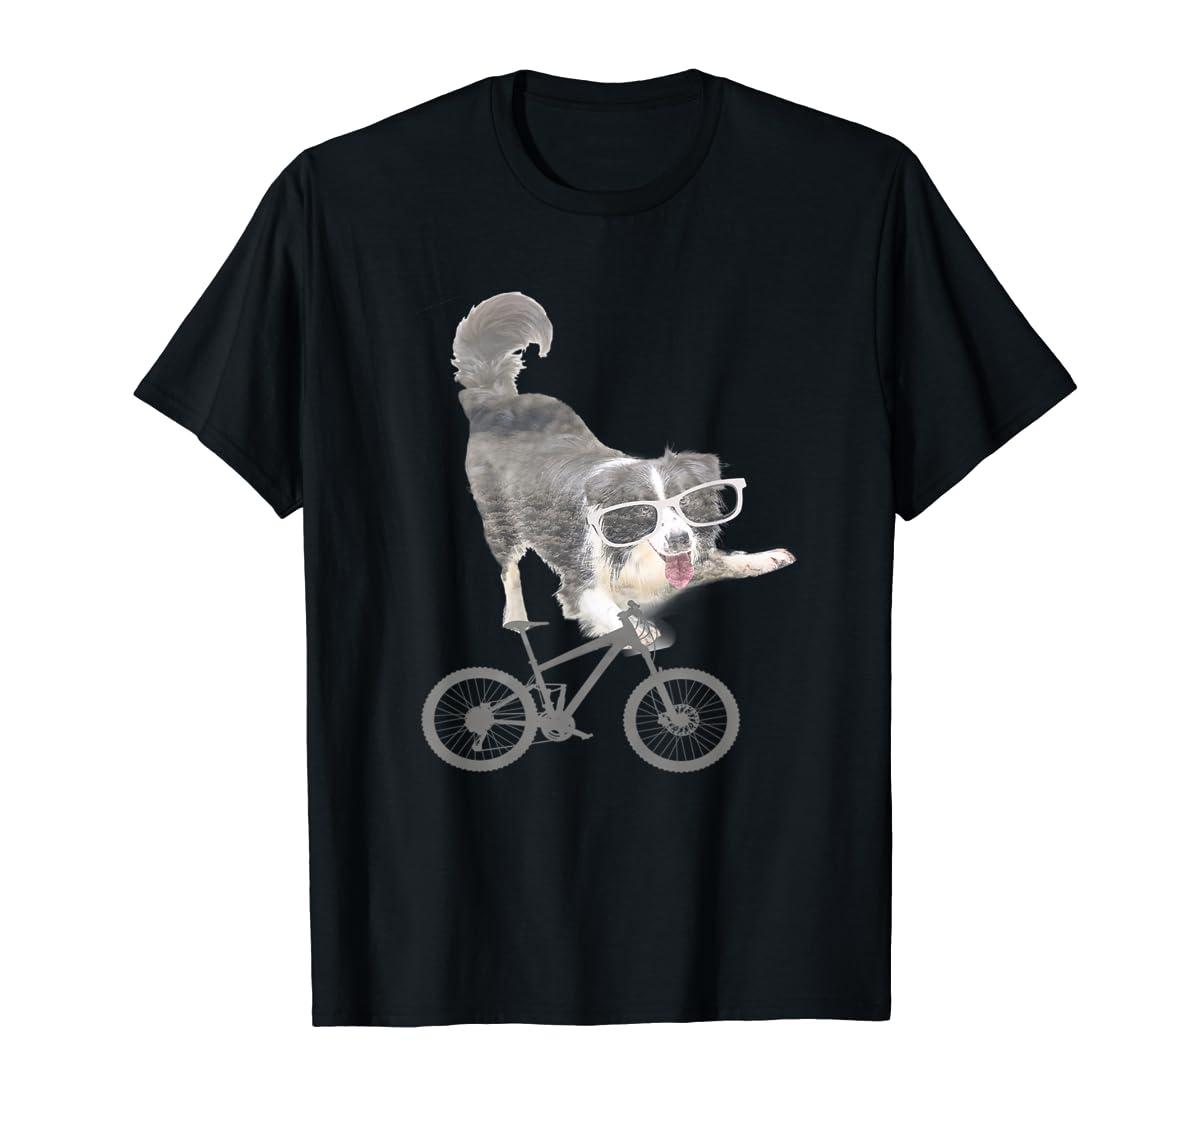 Border collie on a Bicycle T-shirt-Men's T-Shirt-Black